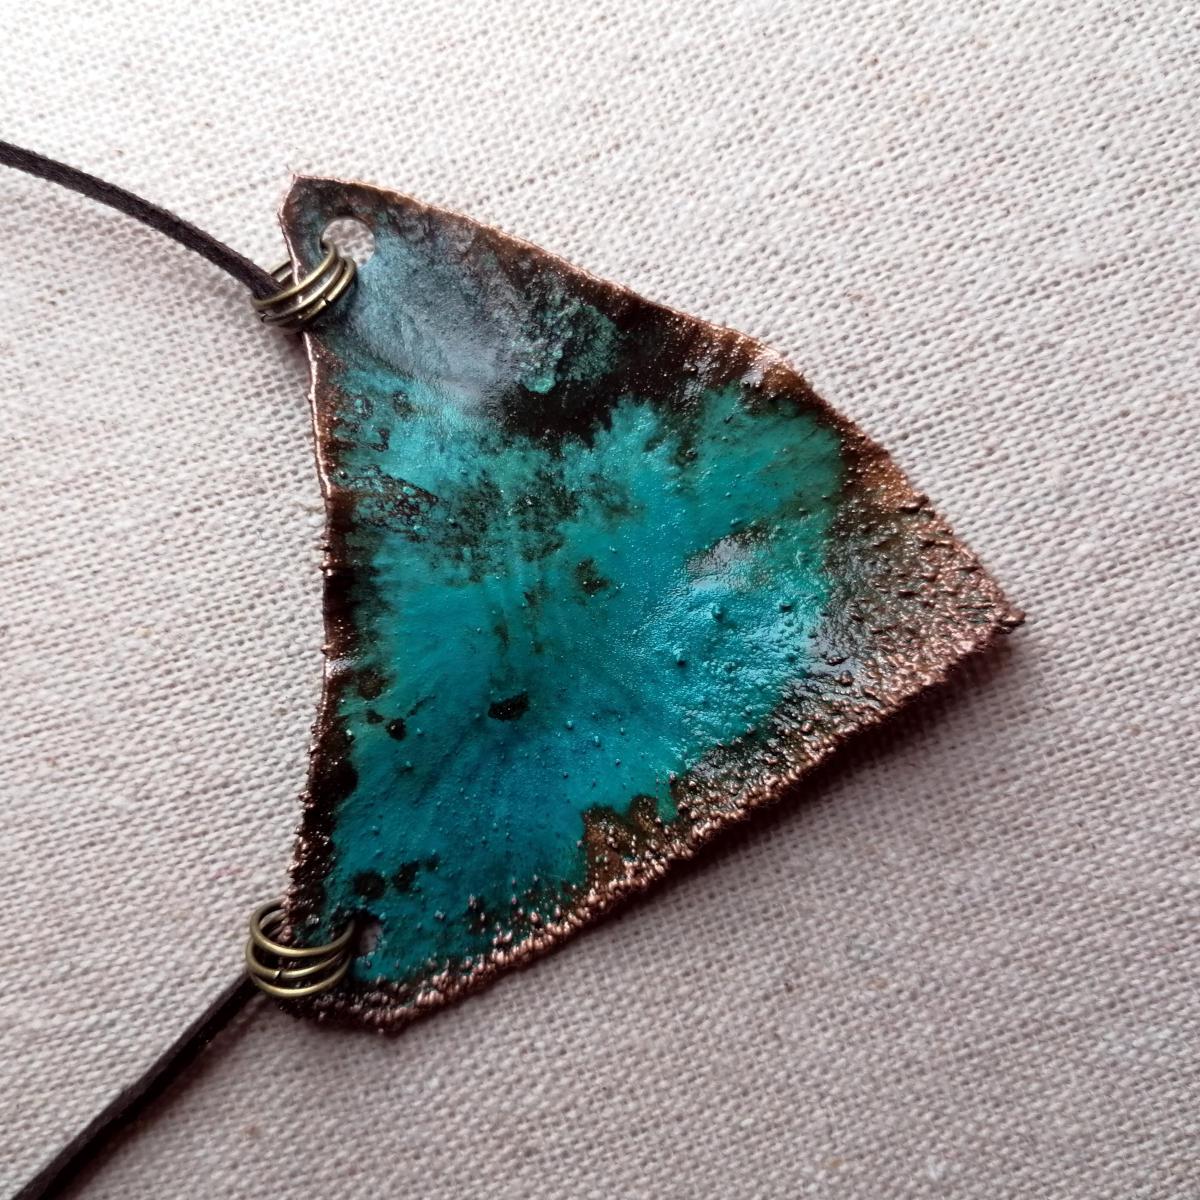 Ancient looking copper pendant